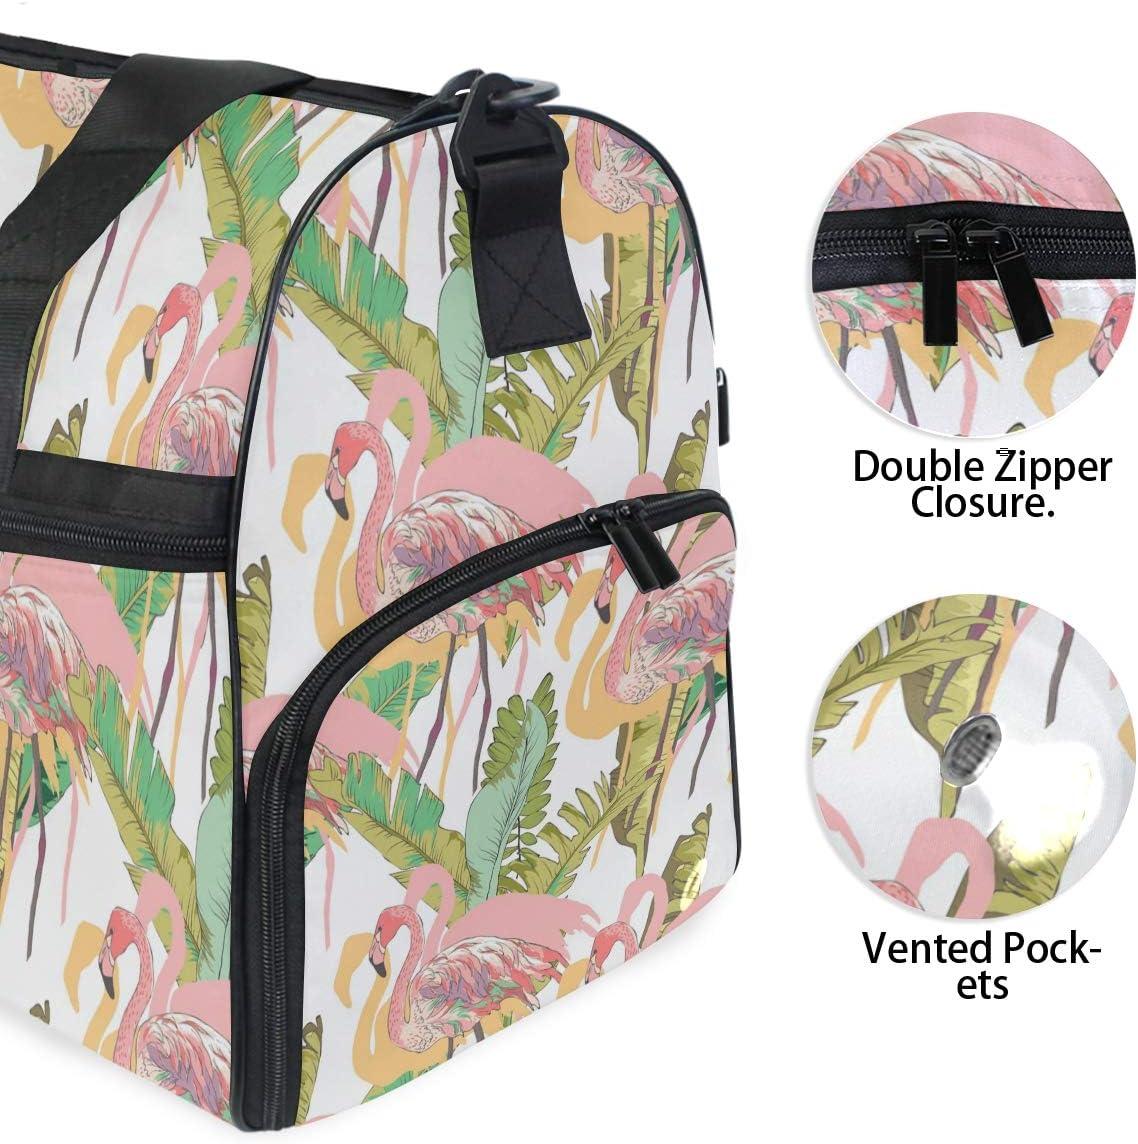 FANTAZIO Beauiful Flamingo Sports Bag Packable Travel Duffle Bag Lightweight Water Resistant Tear Resistant